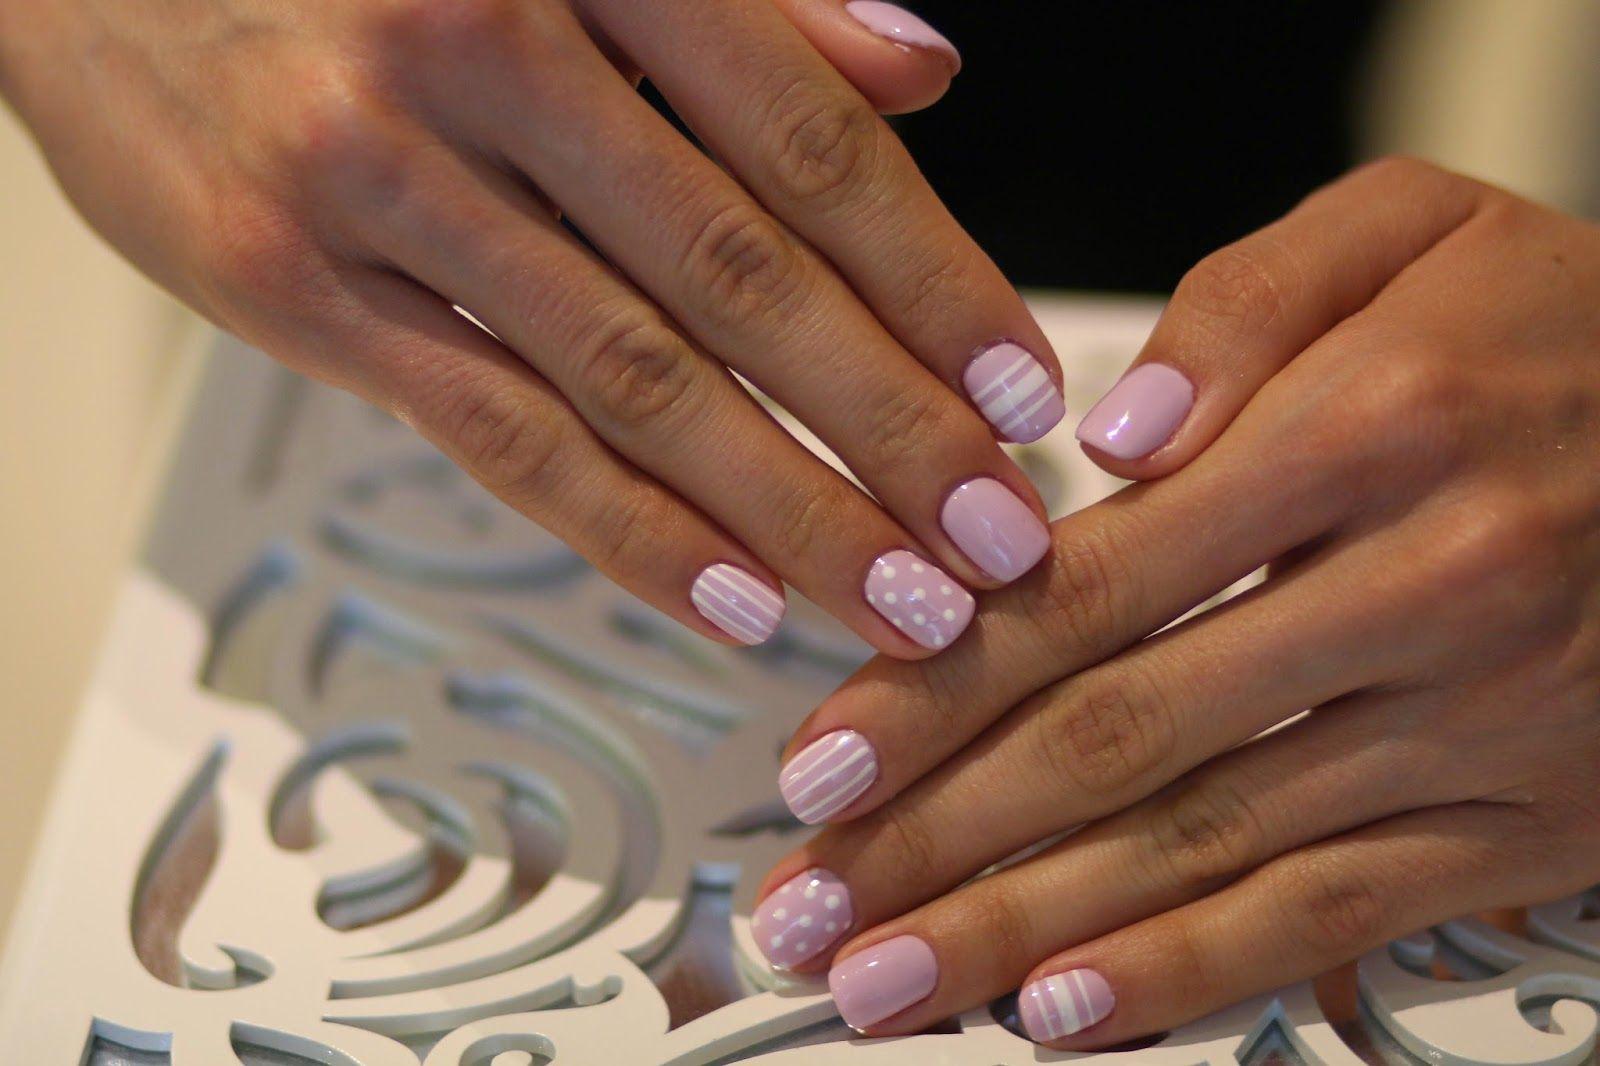 Super Girly Nails Nail Art Studio By Lore Sandra Bendre My